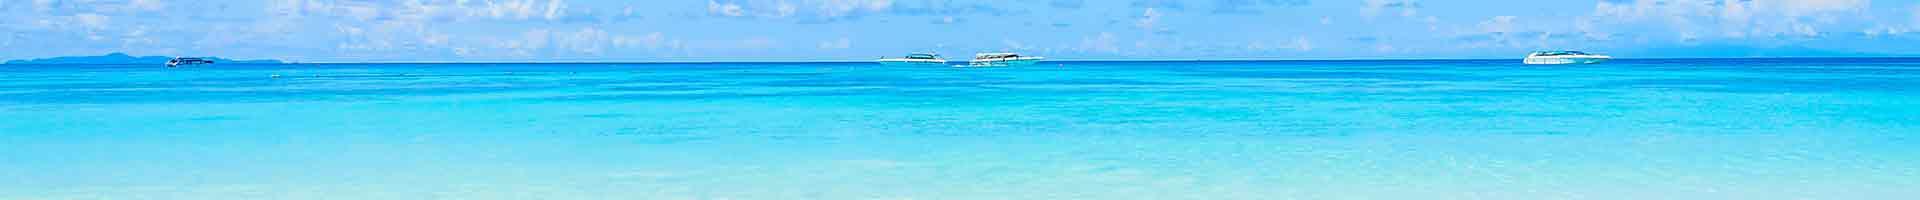 Caribbean Ocean surf